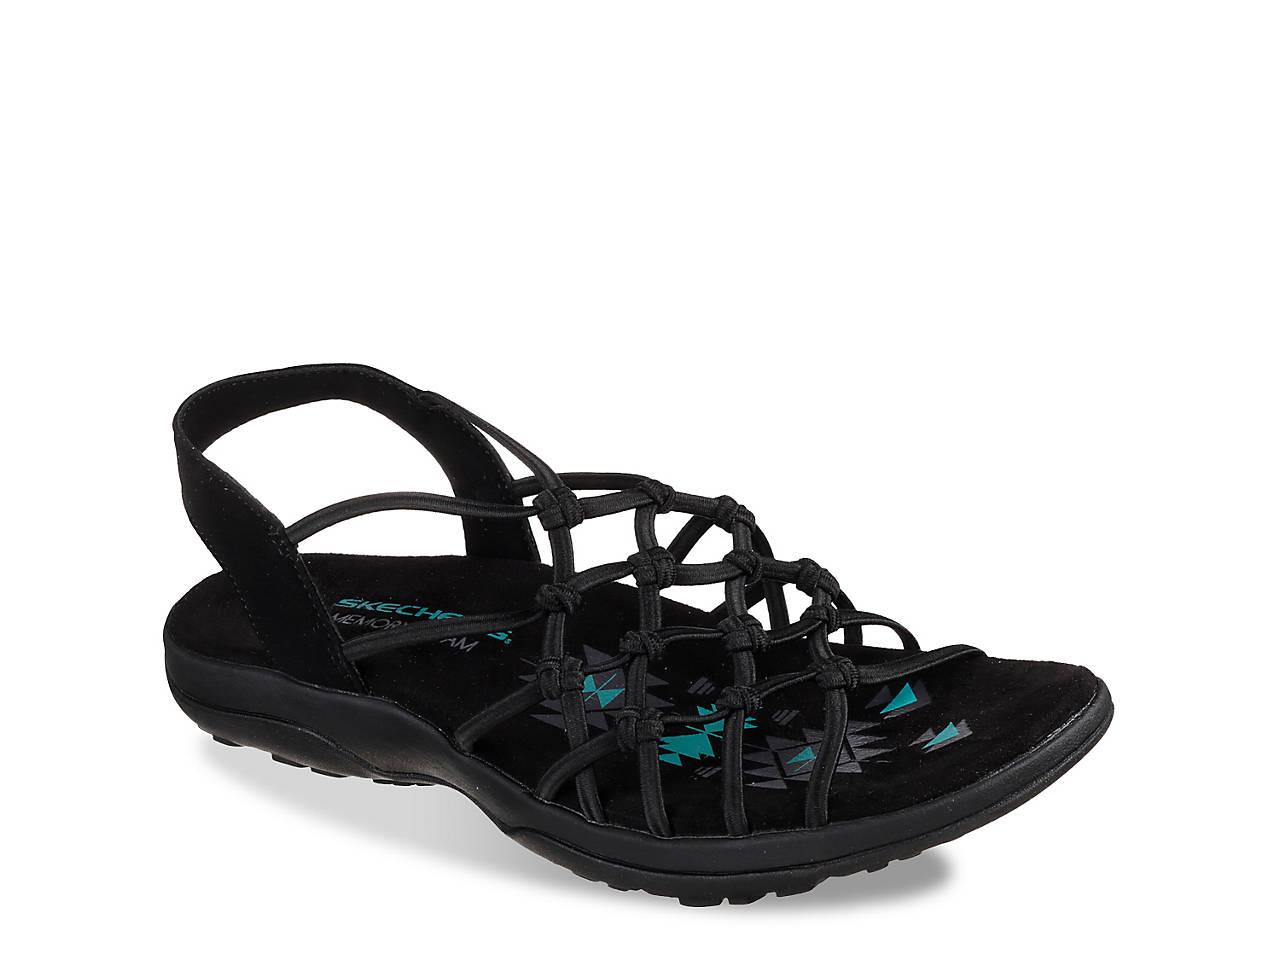 903eac0d8654 Skechers Reggae Slim Forget Me Knot Sandal Women s Shoes